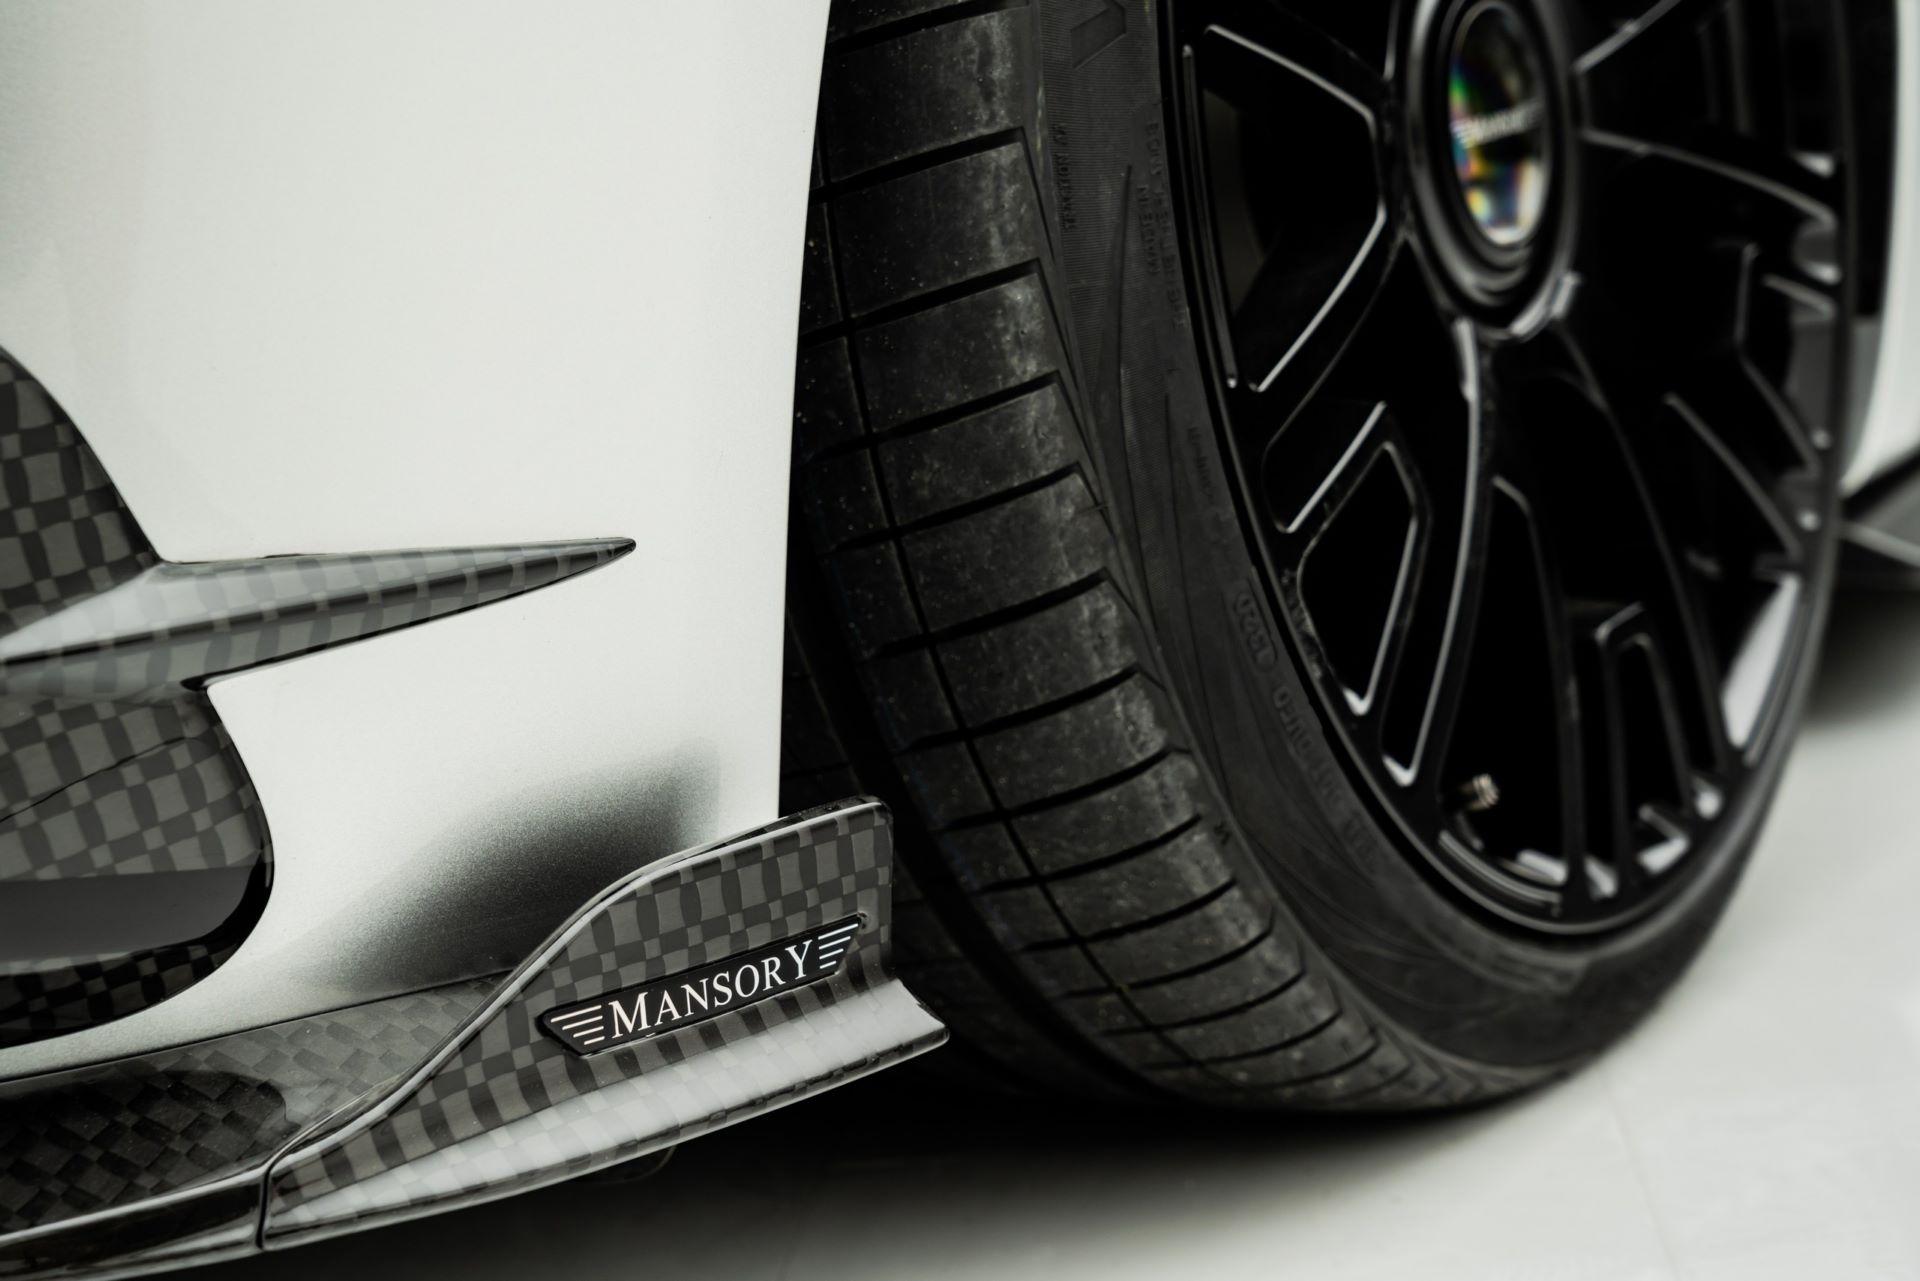 Rolls-Royce-Dawn-Silver-Bullet-Softkit-By-Mansory-17